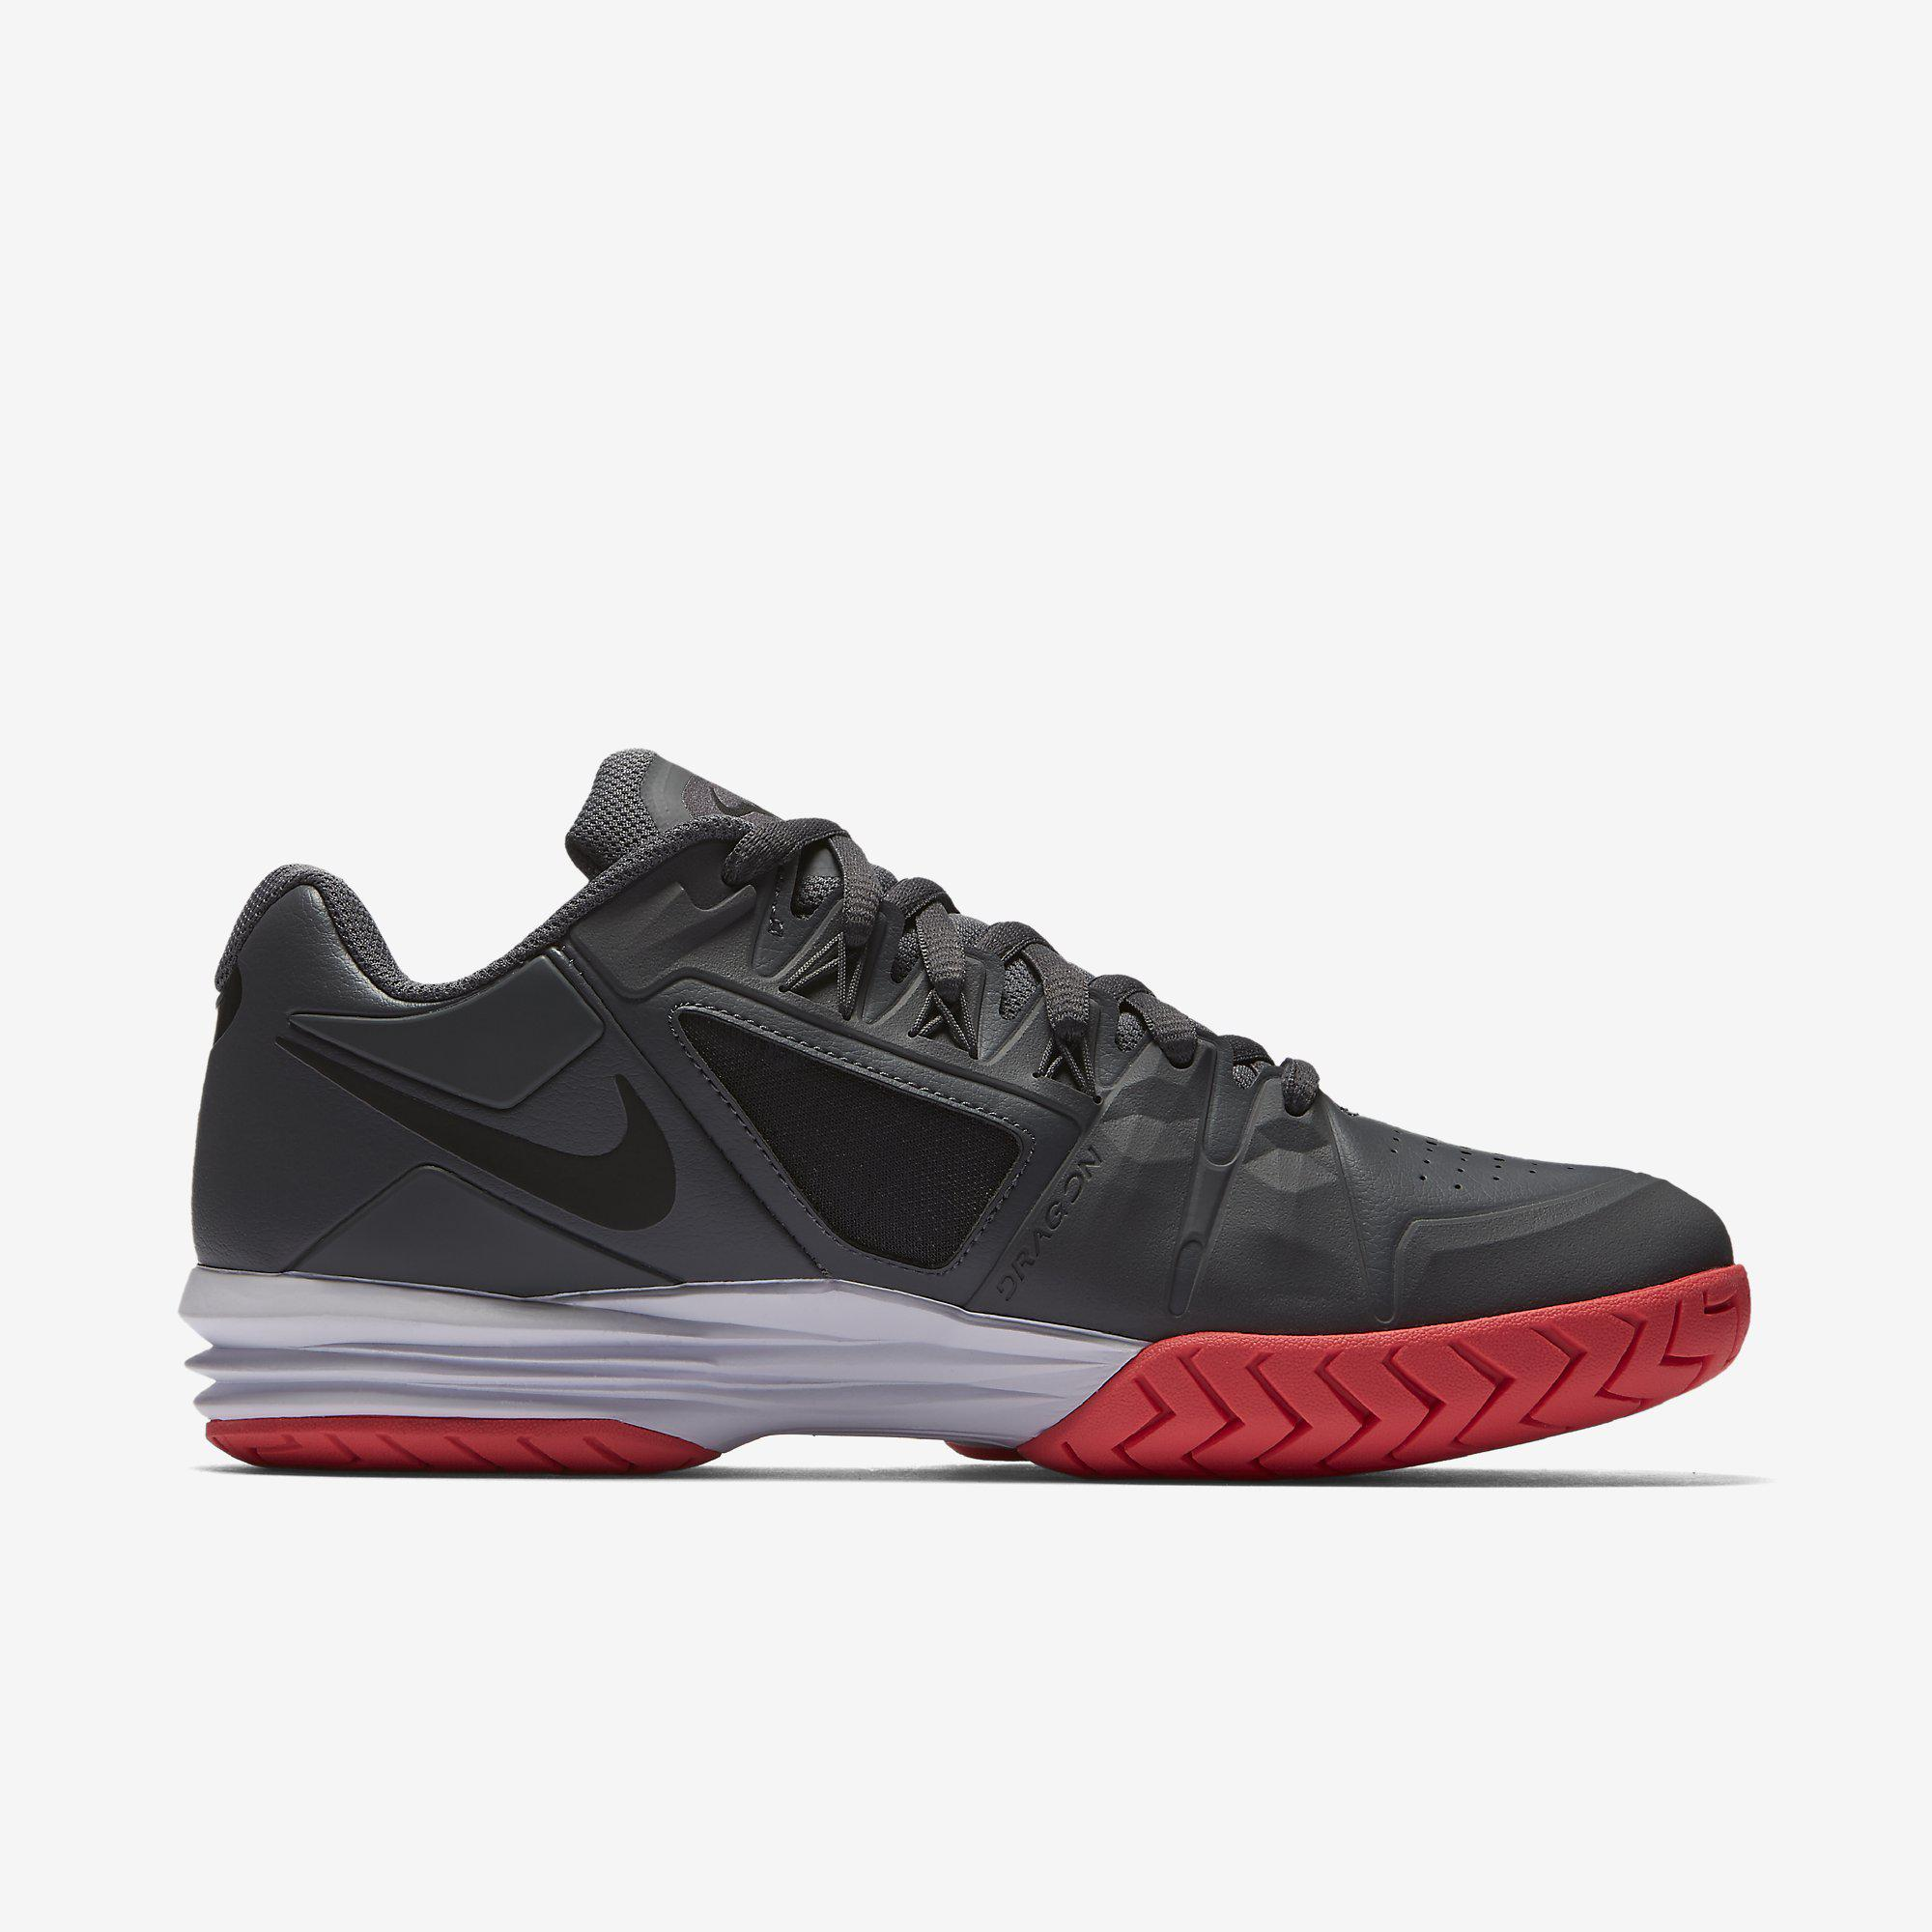 best loved 241be ab6e8 ... clearance nike mens lunar ballistec 1.5 legend rafa tennis shoes dark  grey 8b589 c9992